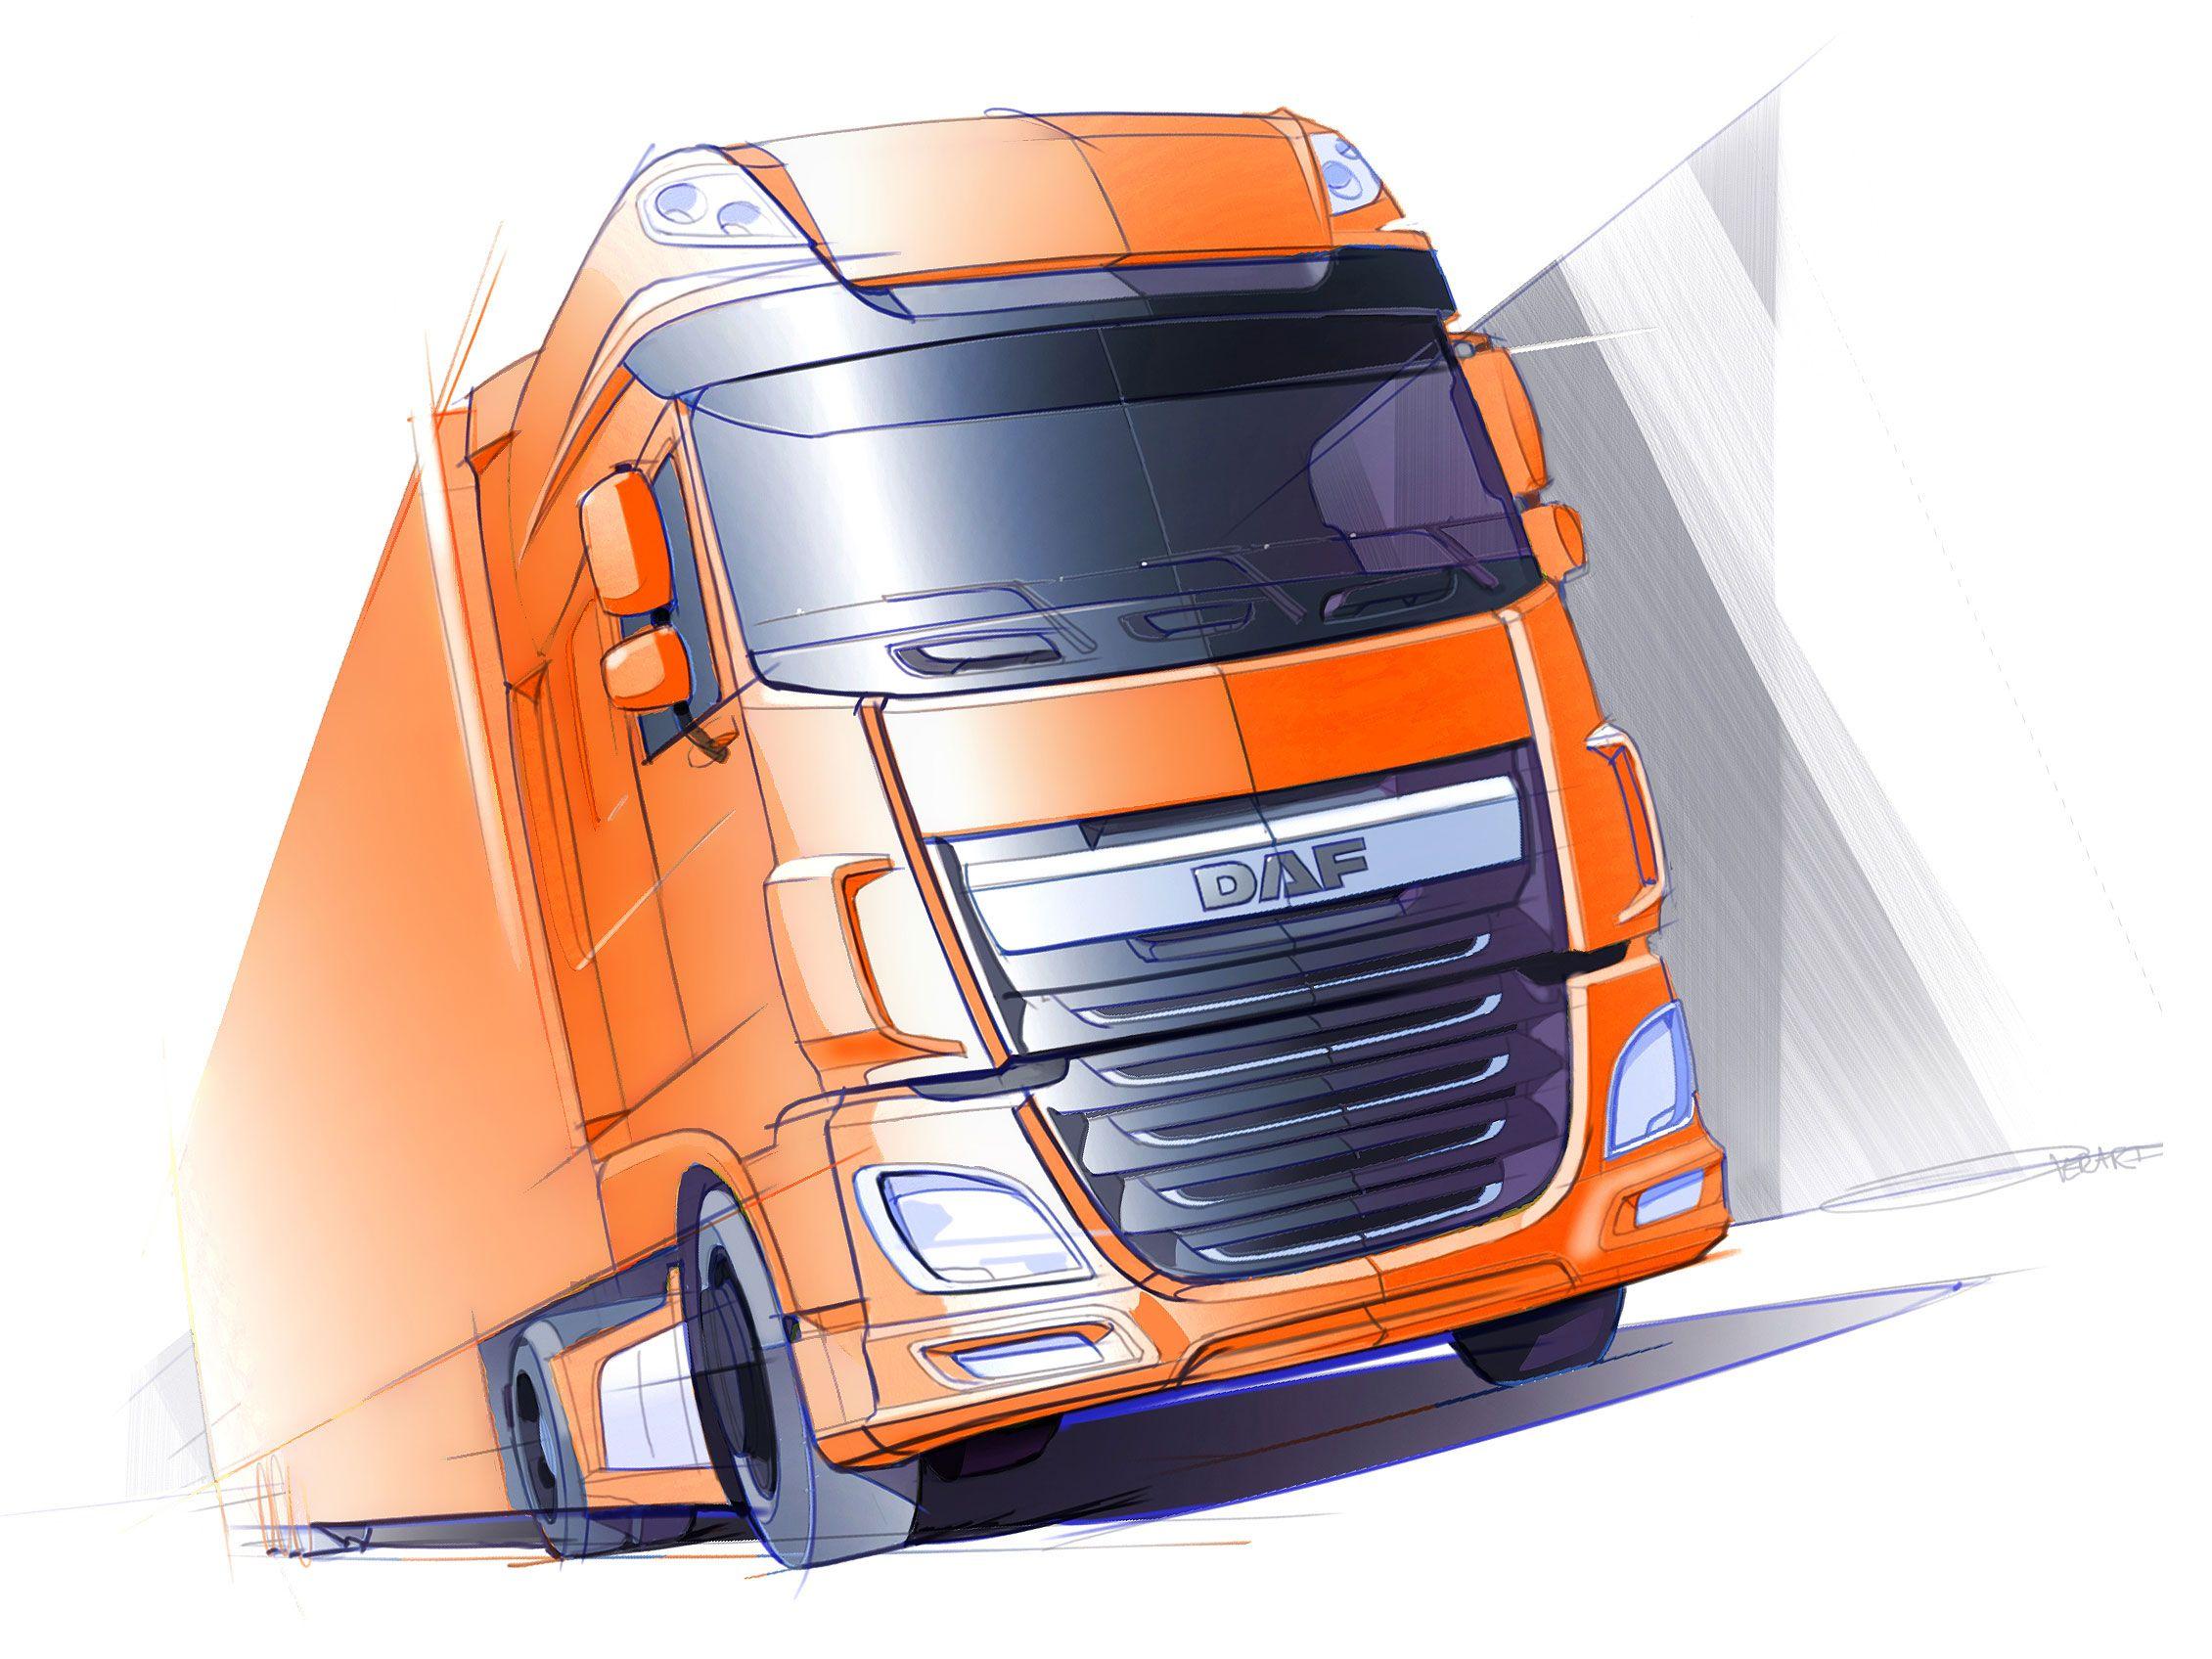 New Daf Xf Design Sketch Car Body Design Truck Design Car Design Sketch Design Sketch